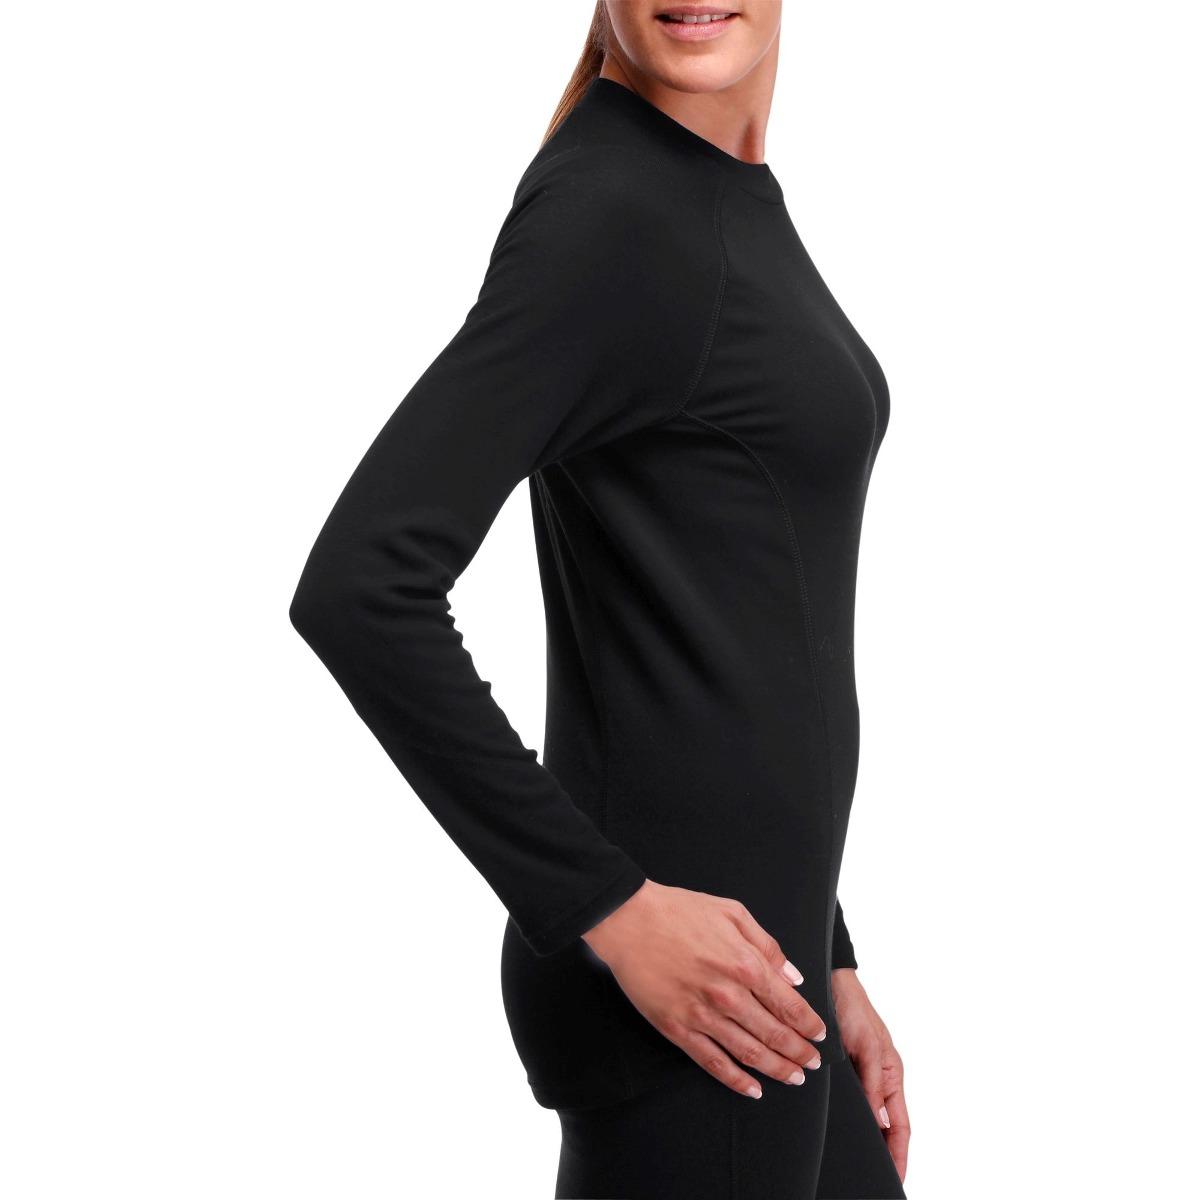 03a71c6013 blusa camiseta feminina térmica inverno corrida caminhada. Carregando zoom.